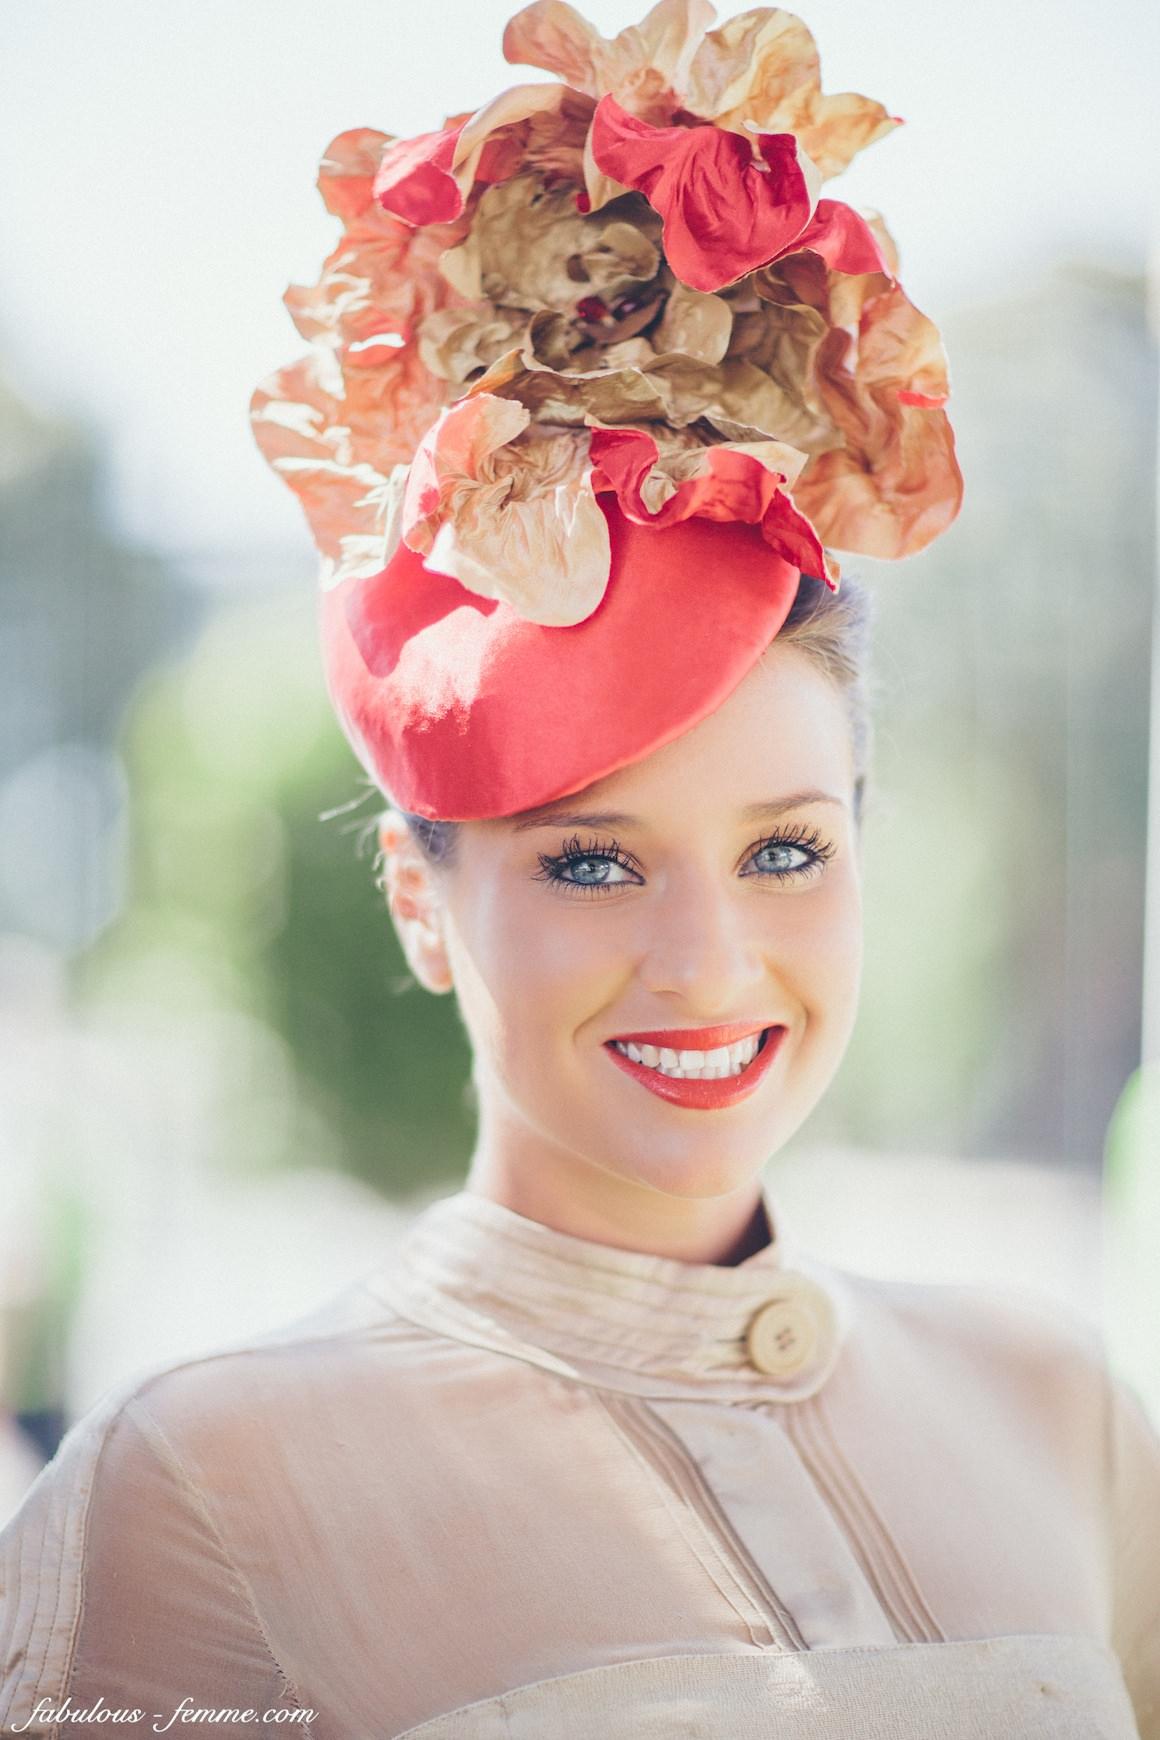 female fashion - classic style